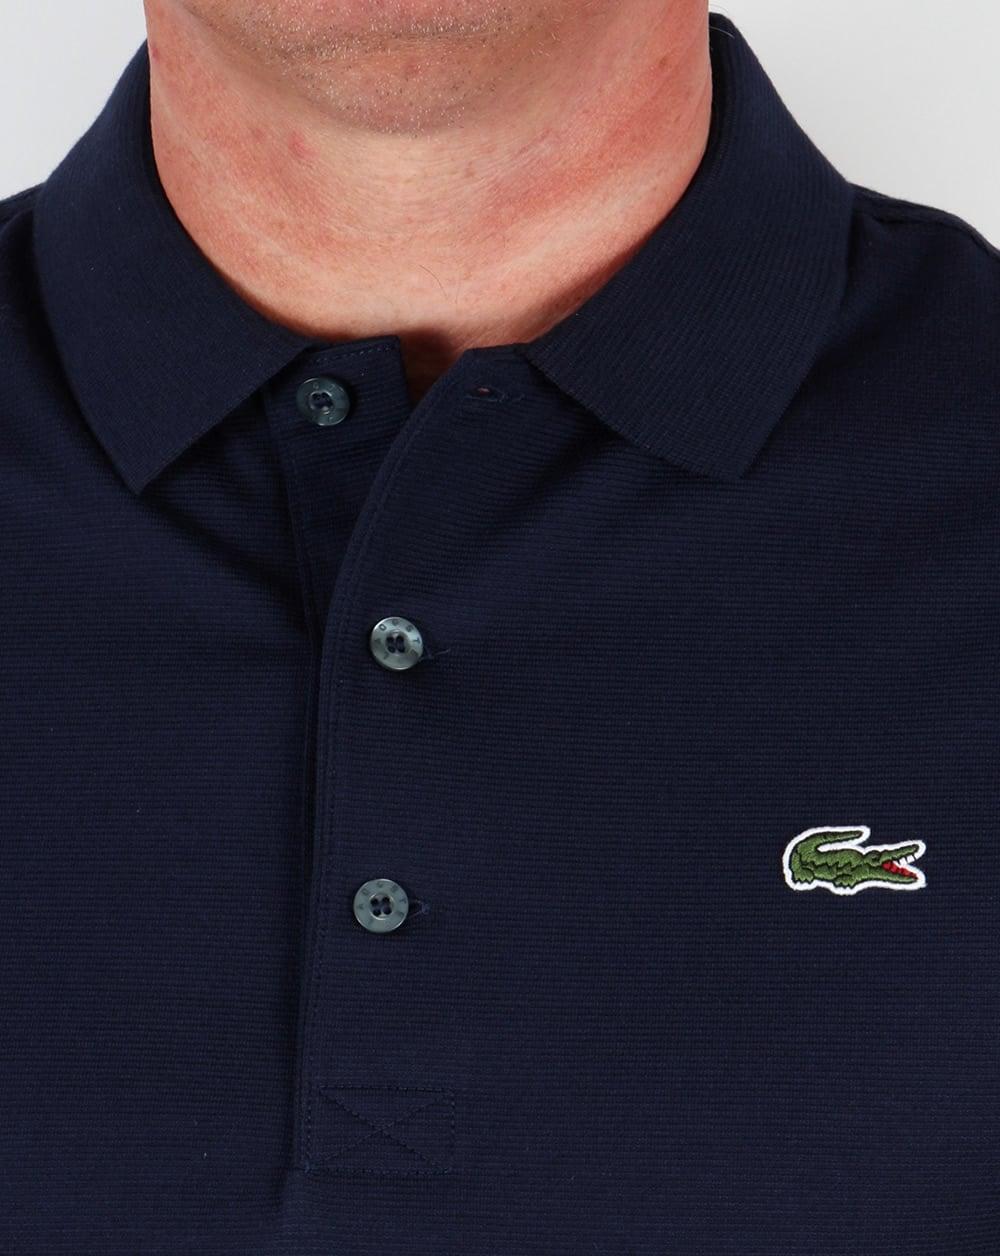 c8c4aa99 Lacoste Polo Shirt Navy